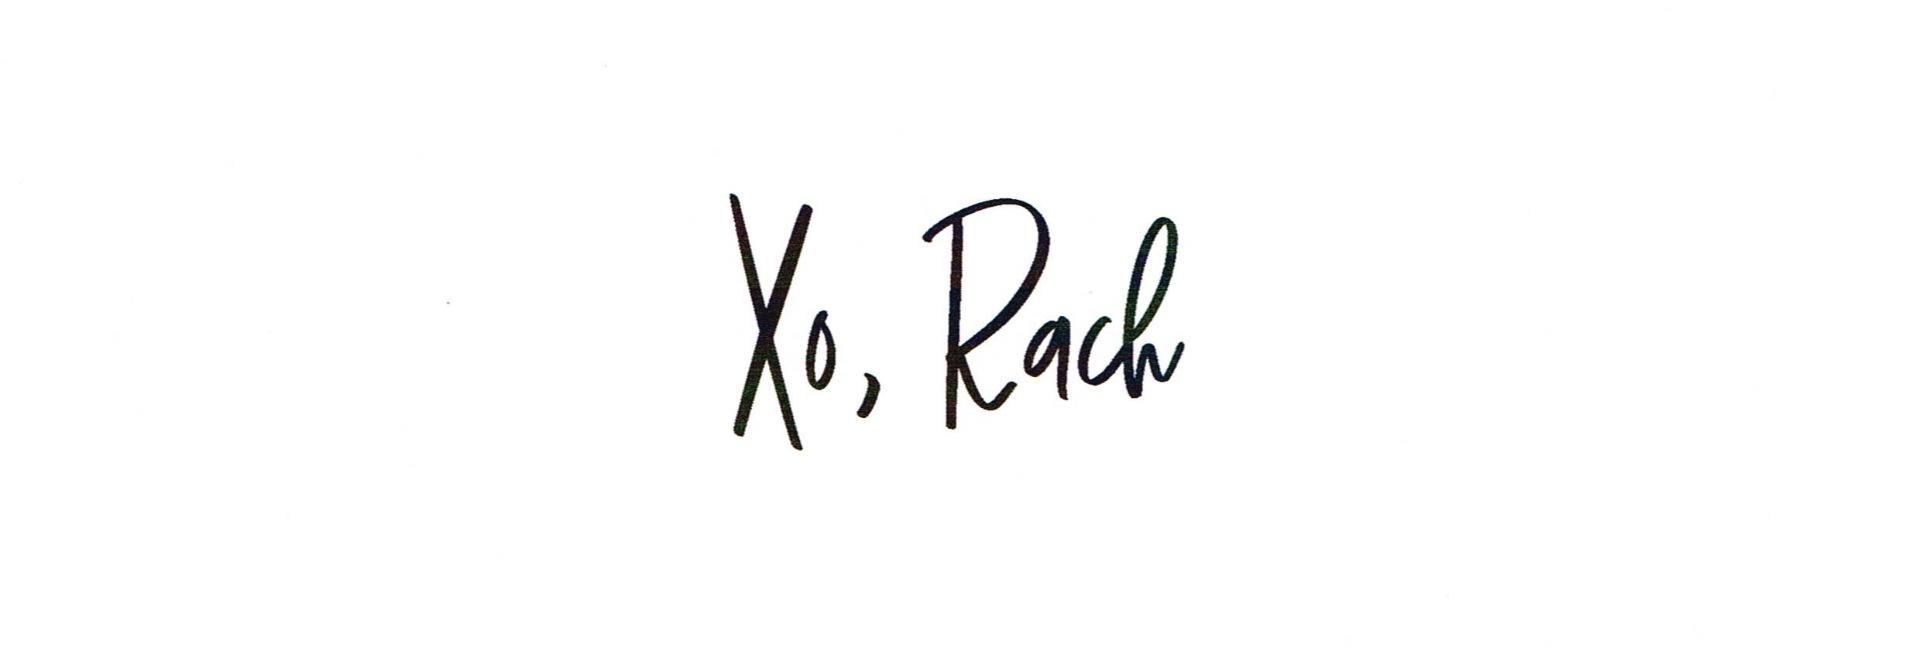 Xo, Rach Signature.jpg